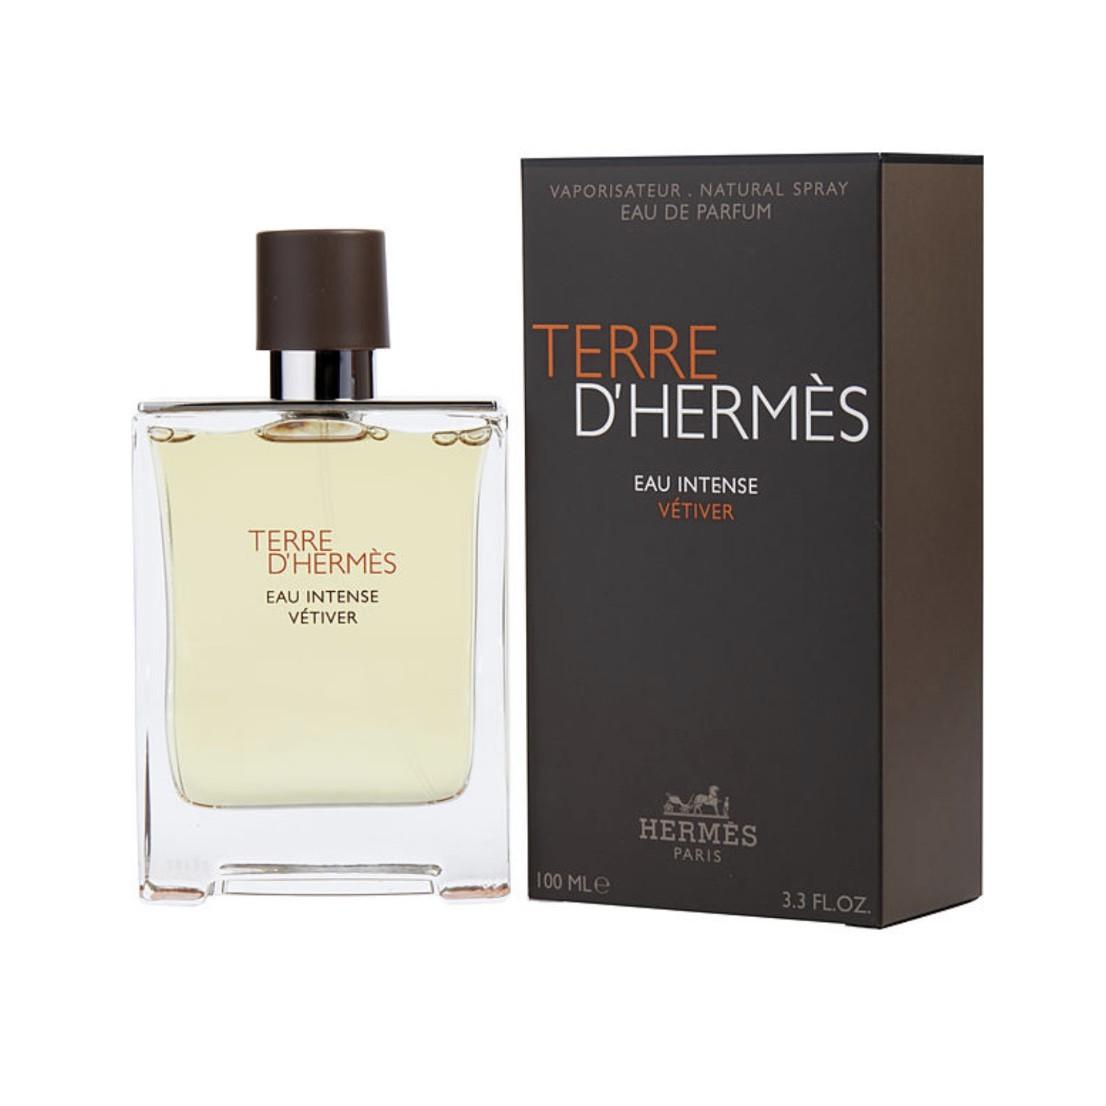 Мужские духи HERMES Terre D'Hermes Eau Intense Vetiver 100ml парфюмированная вода, цитрусовый древесный аромат